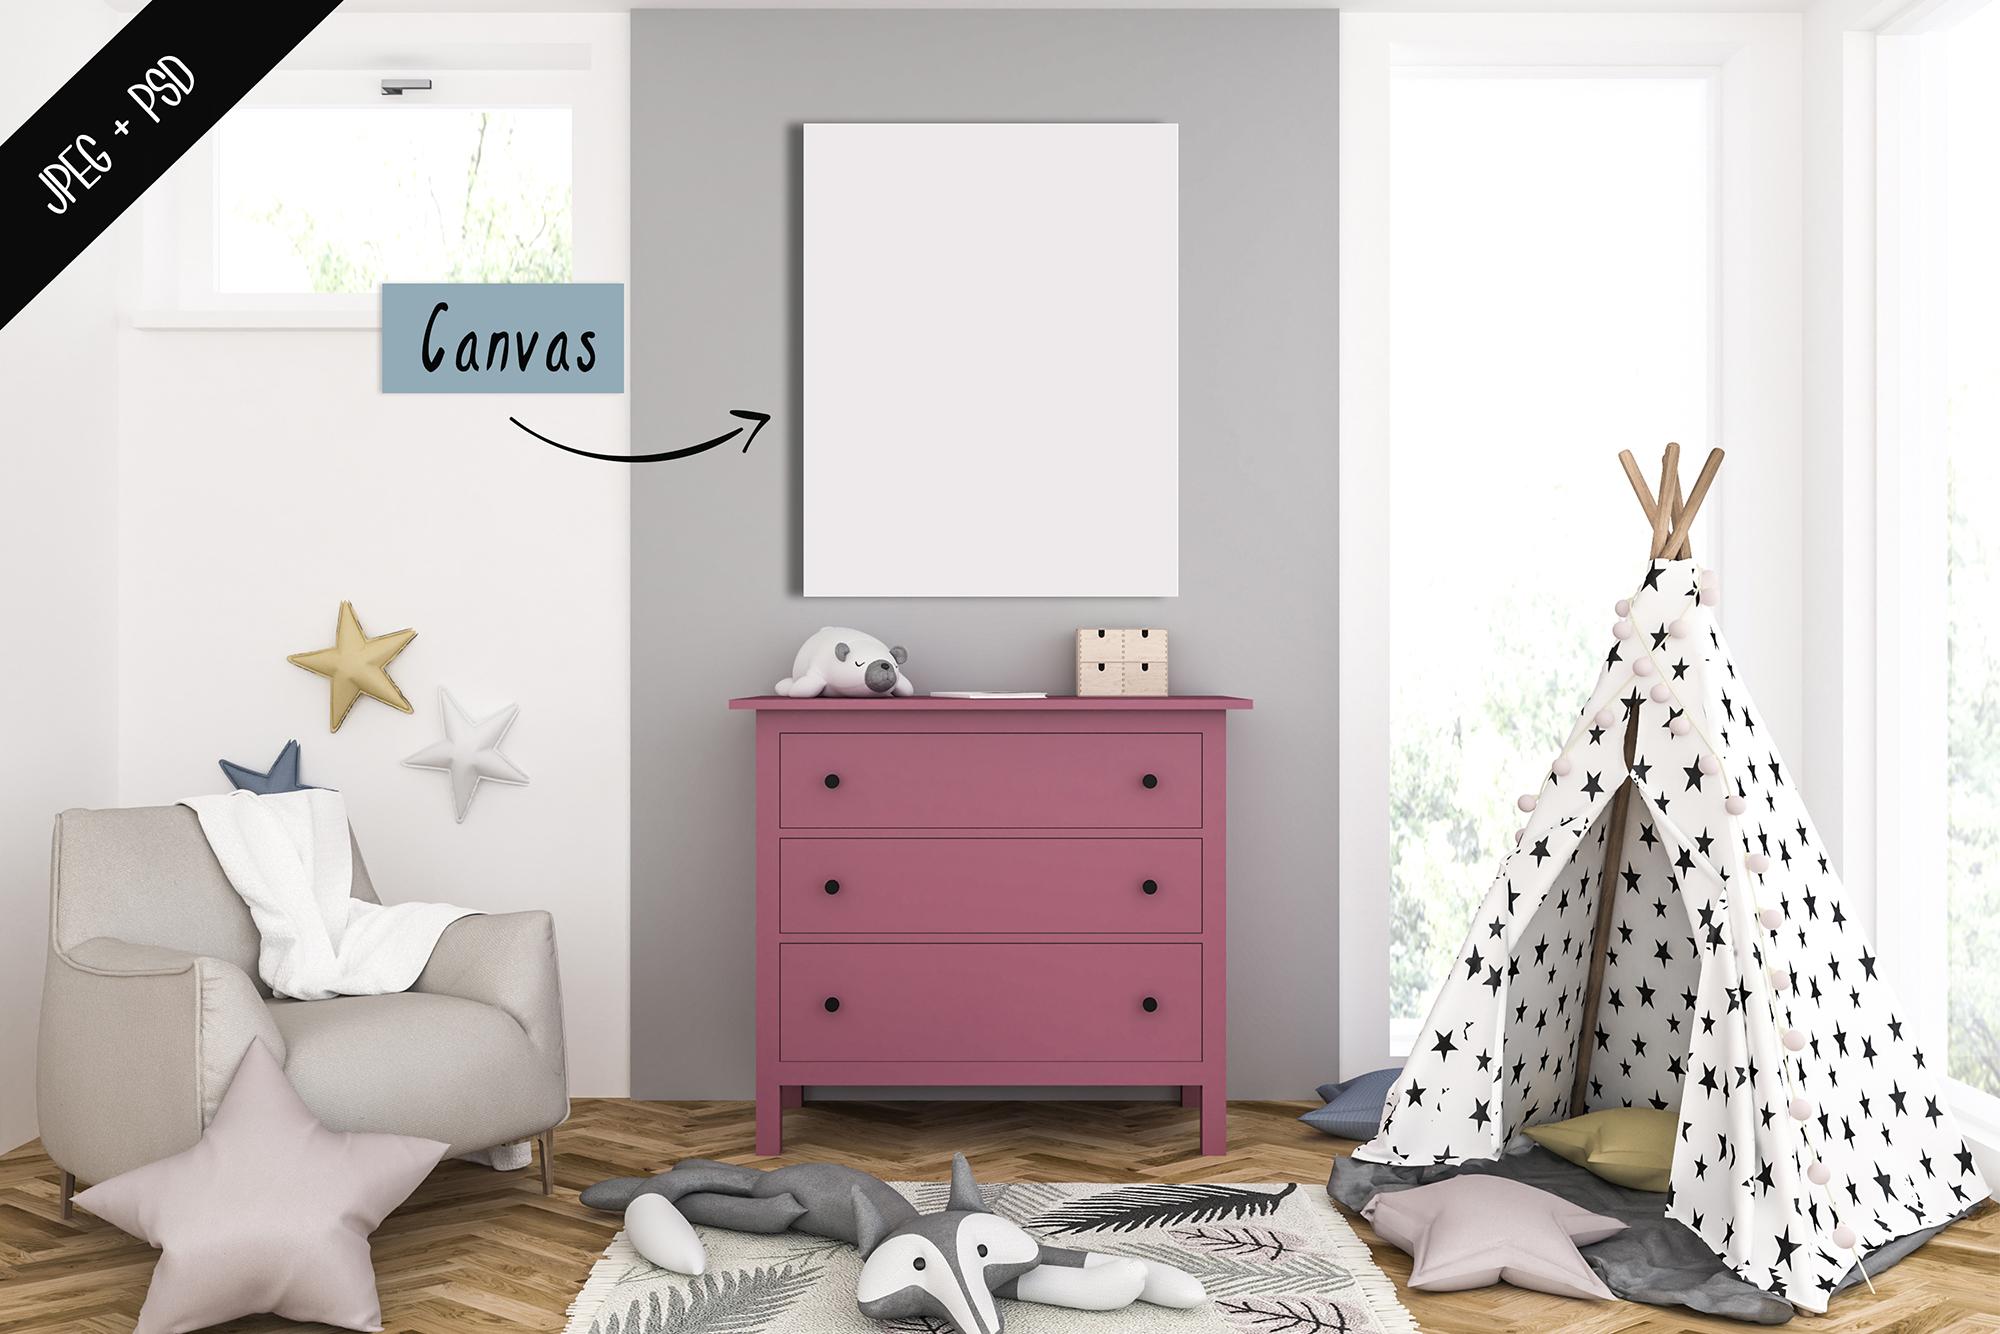 Frame mockup creator - All image size - Interior mockup example image 8